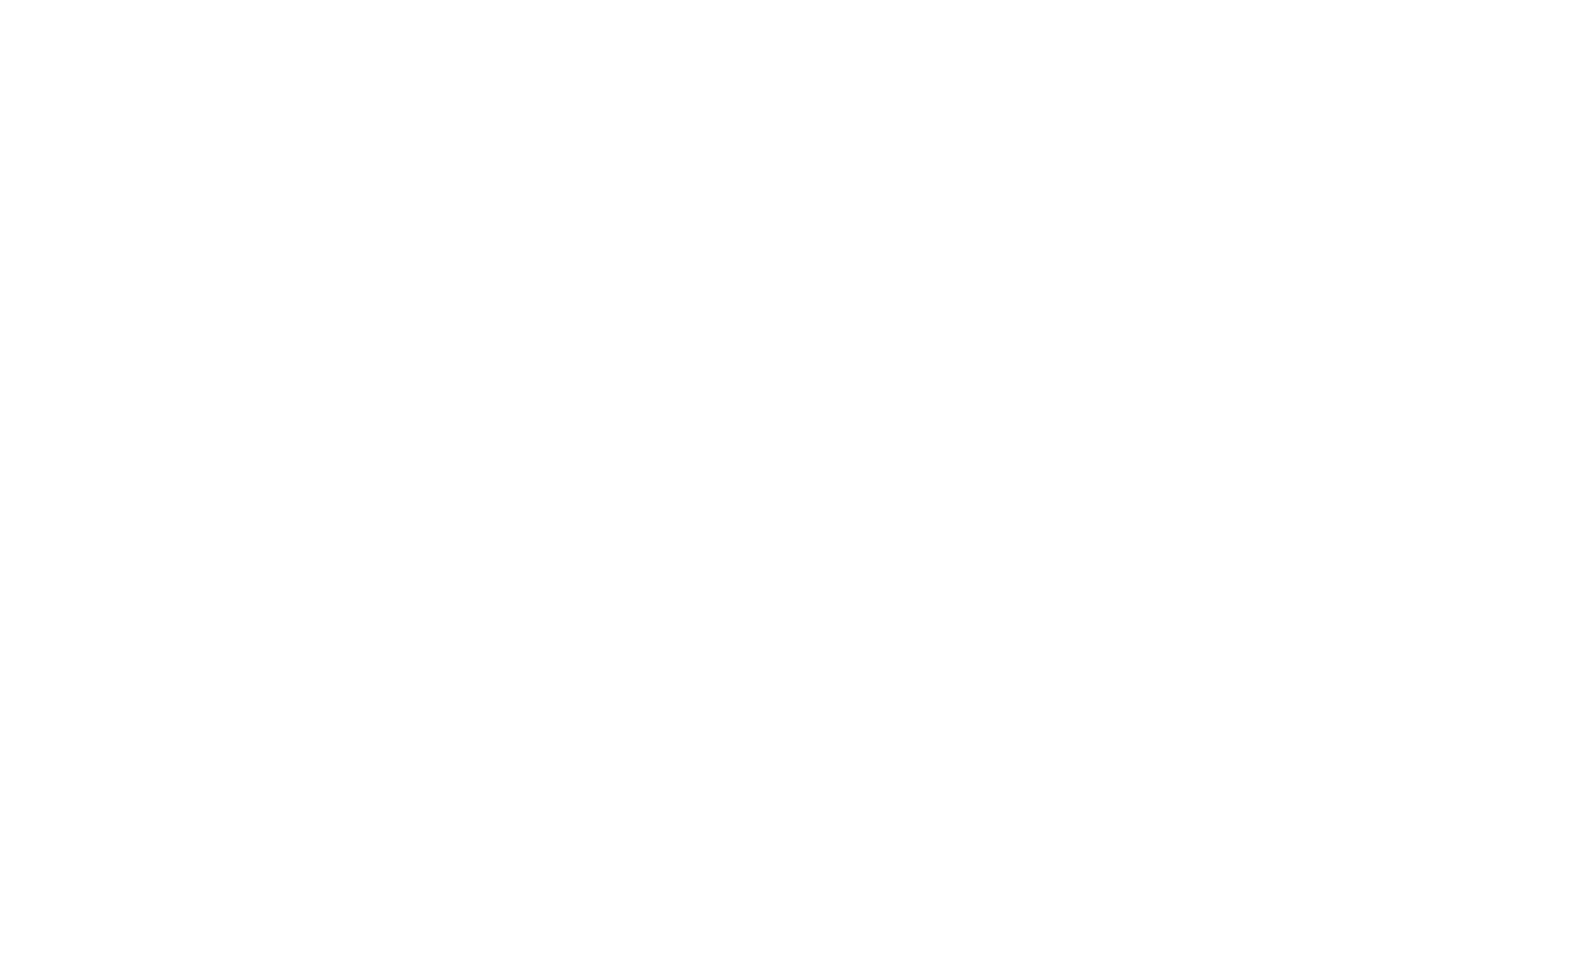 paleo-mag-logo.png